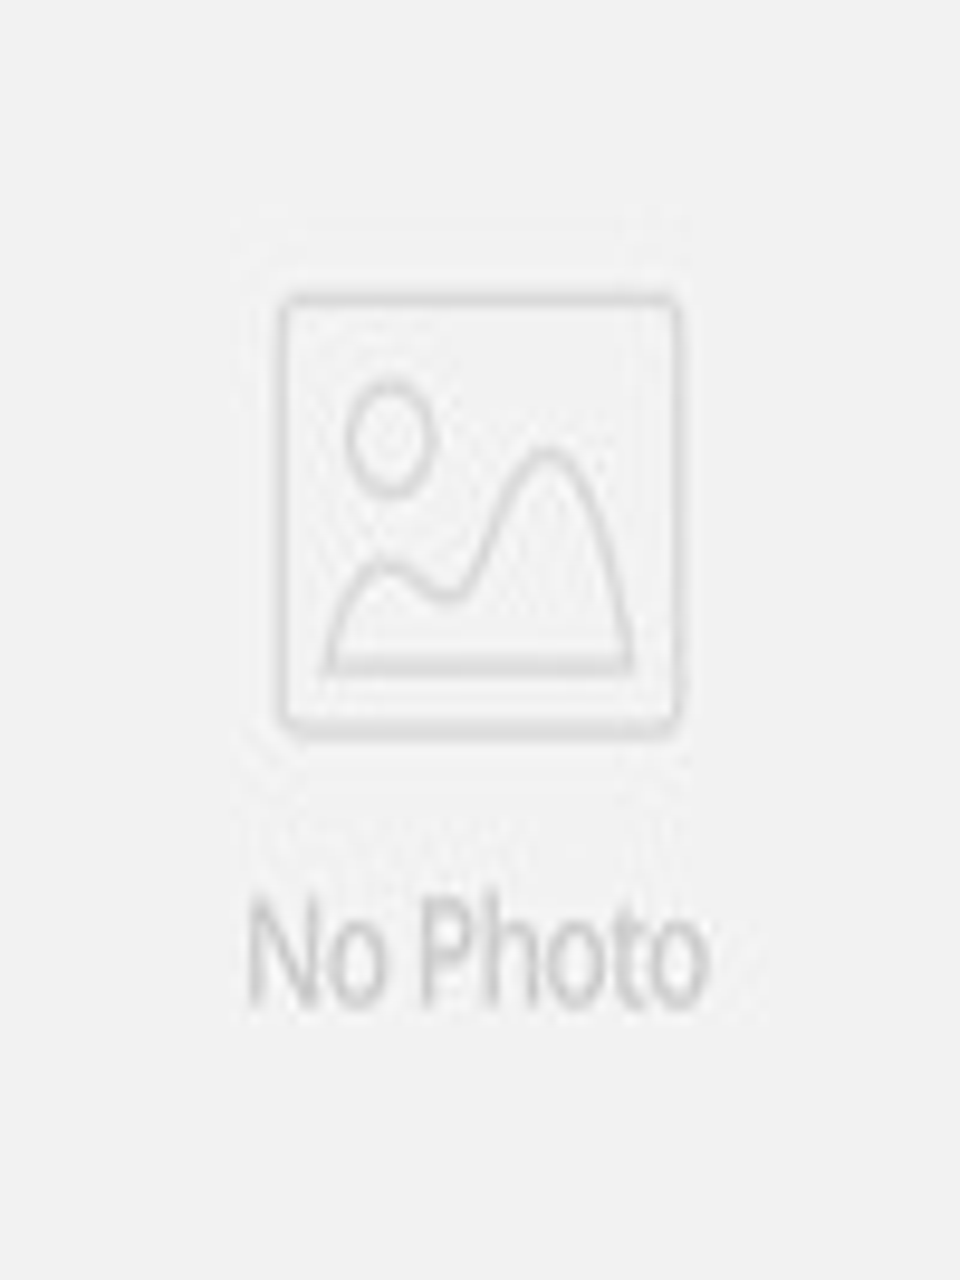 Dvd tsd101 remote control dvd remote control(China (Mainland))